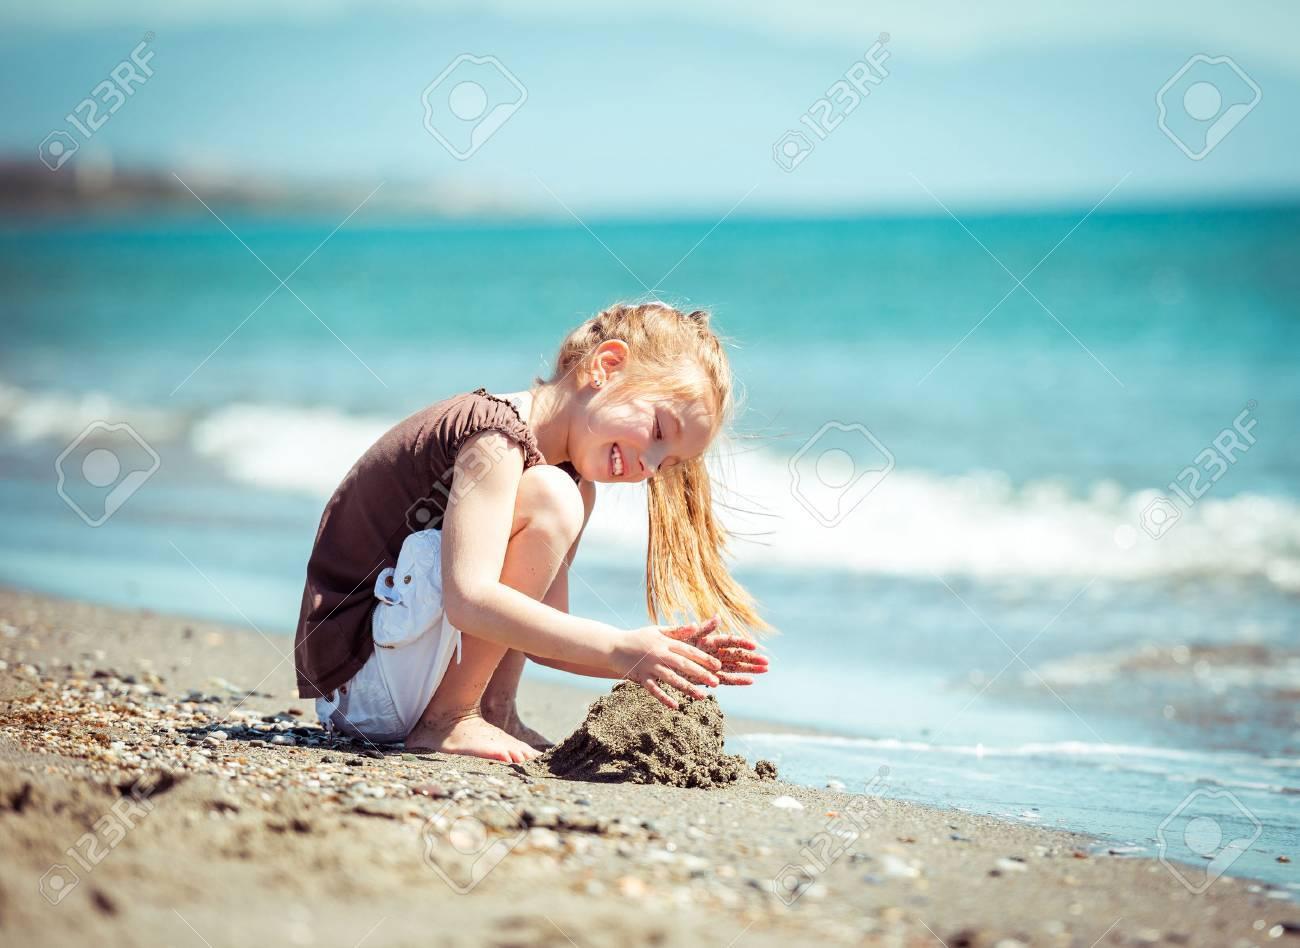 cute little girl run on tropical beach vacation - 39461607